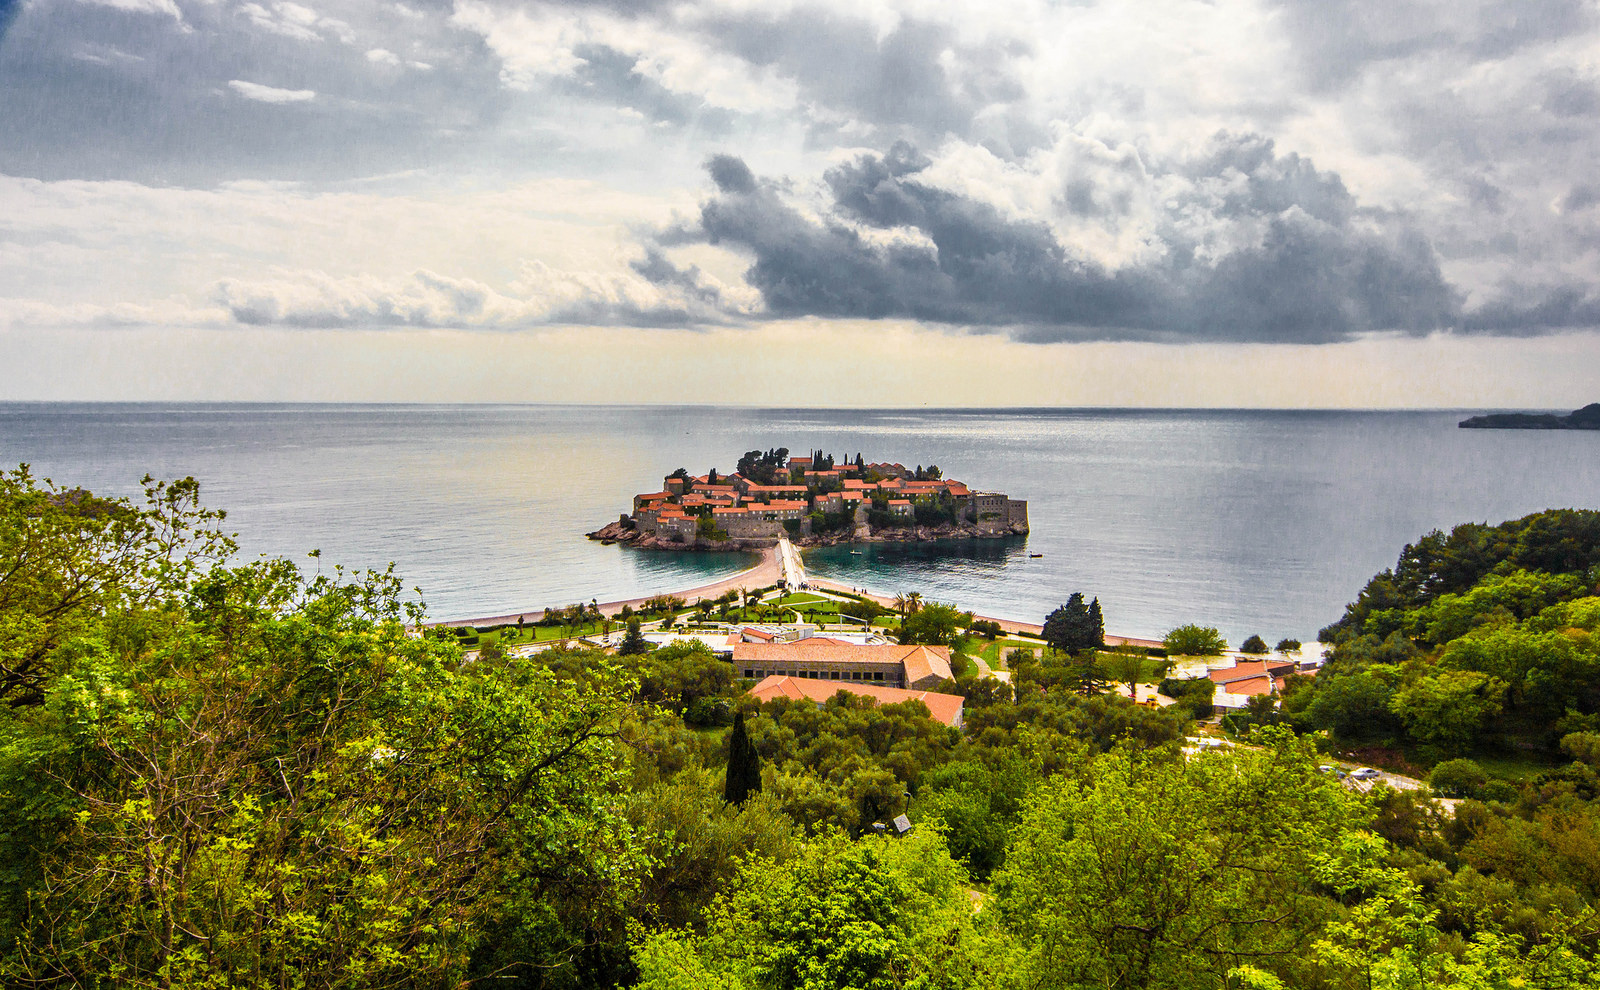 crna_gora_montenegro_st_stefan_sveti_stefan_luxury_travel_concierge_antropoti